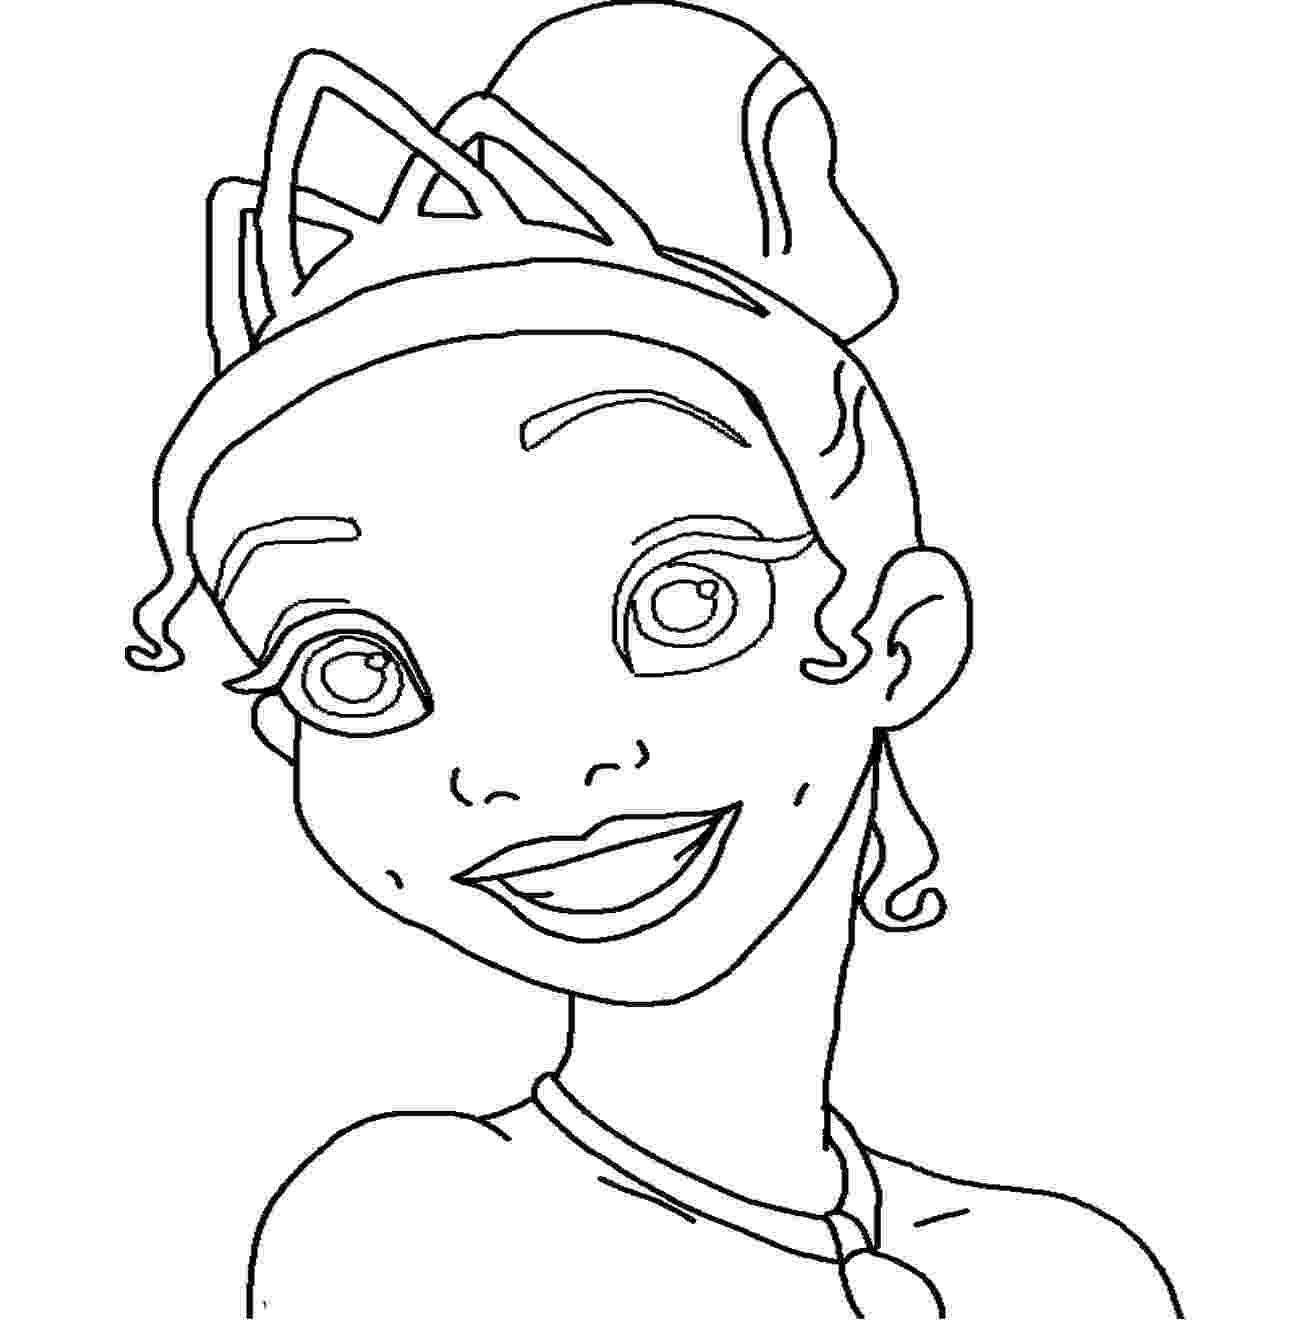 coloring pages for girls princess disney princess tiana coloring pages to girls pages coloring for girls princess